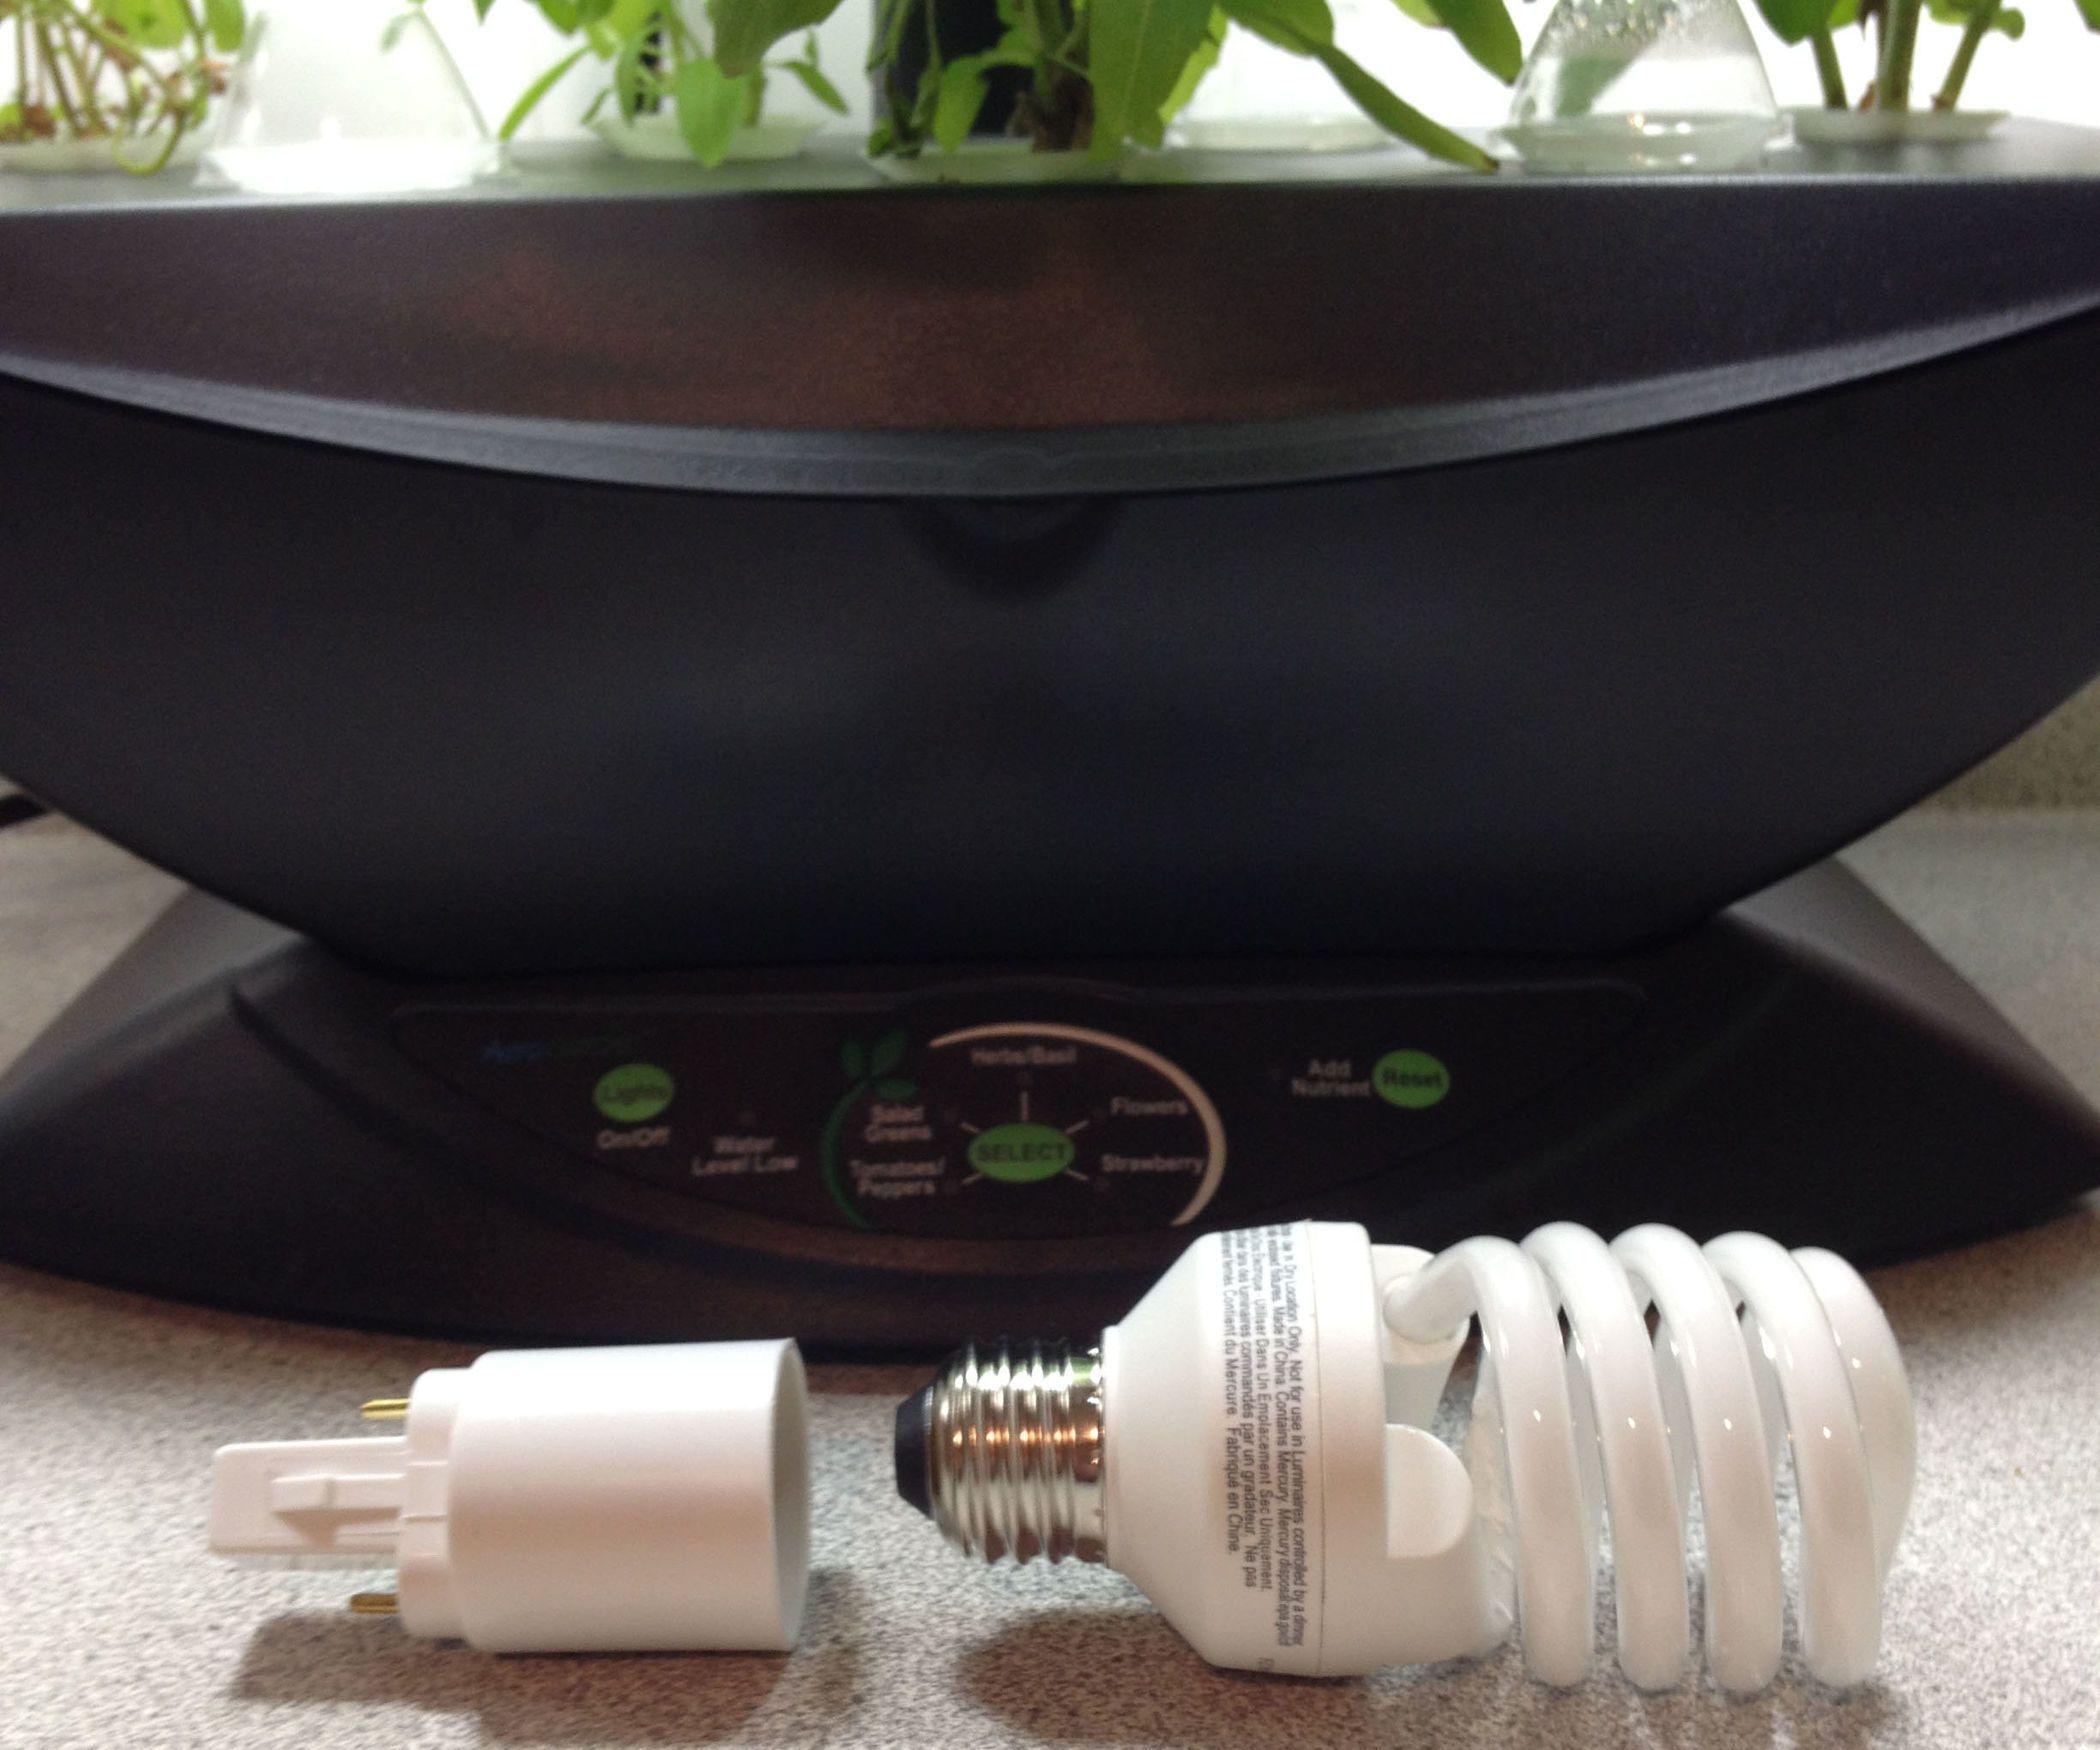 Hydroponic Nutrients Cheap Grow Lights Hydroponics 400 x 300